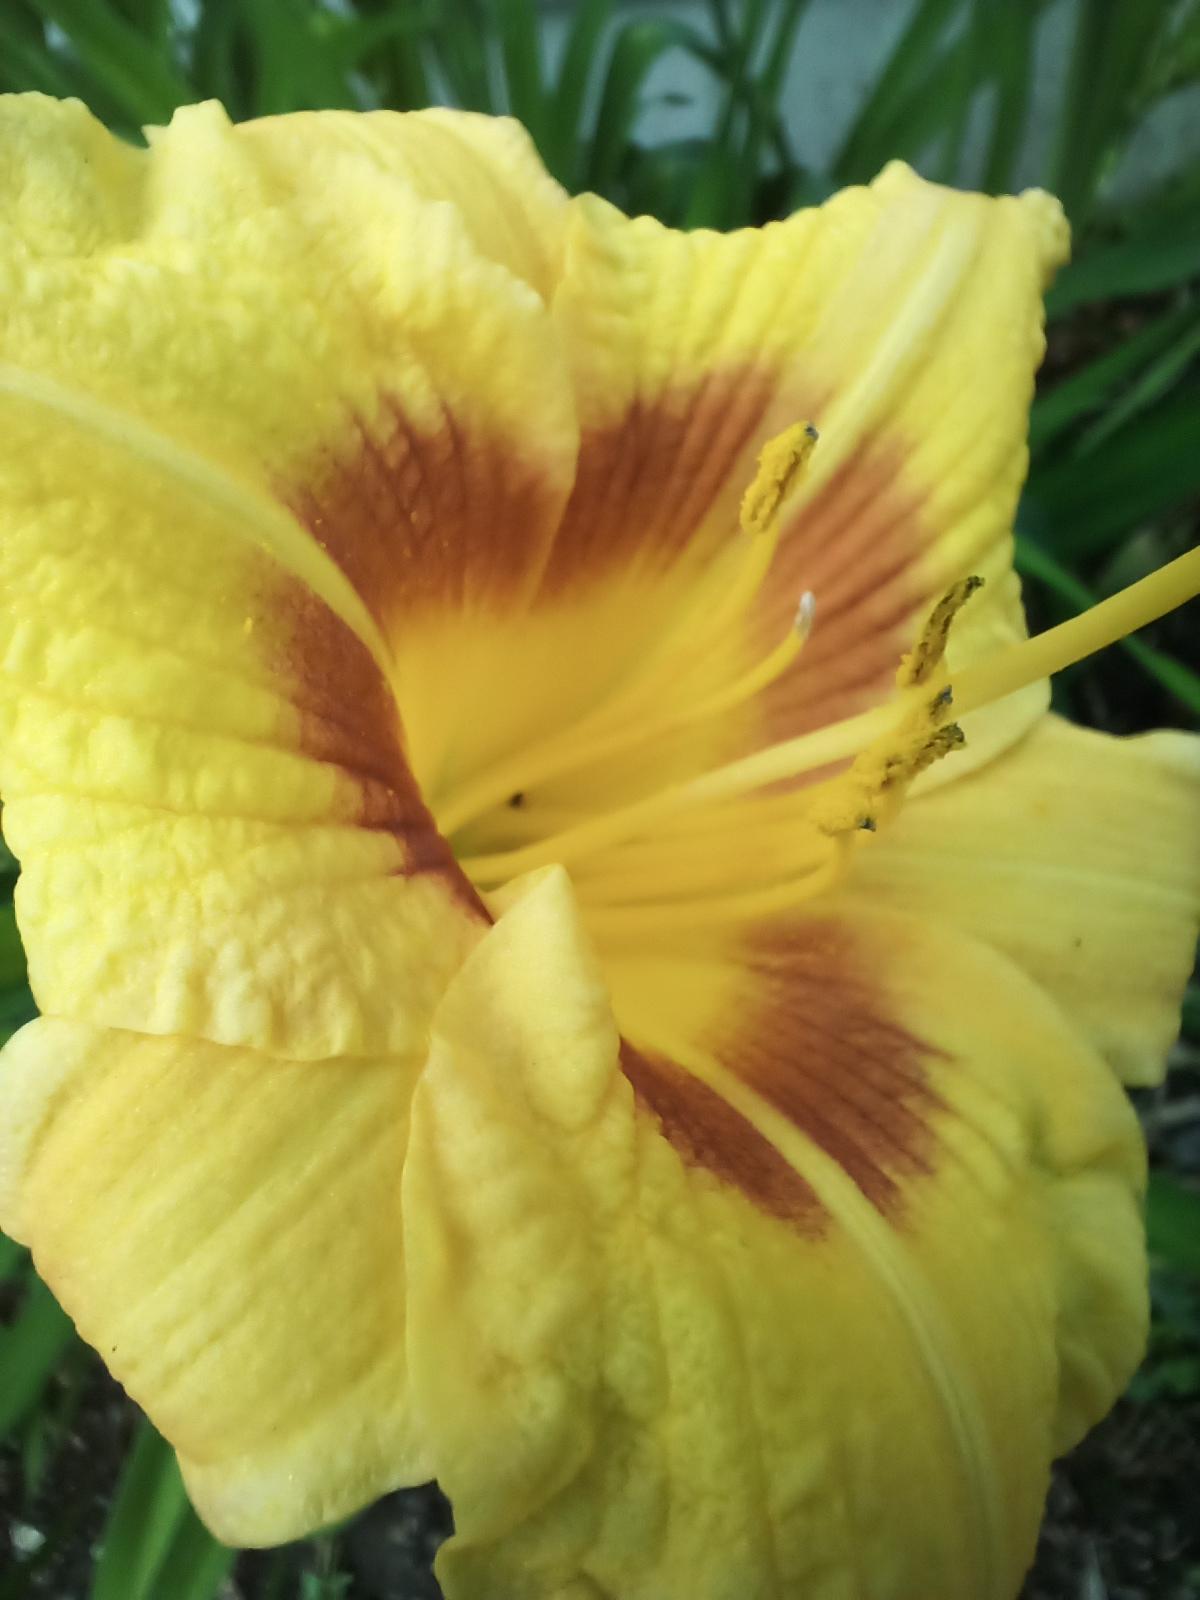 Doogee S96 Pro Camera Samples macro shot of a yellow flower.